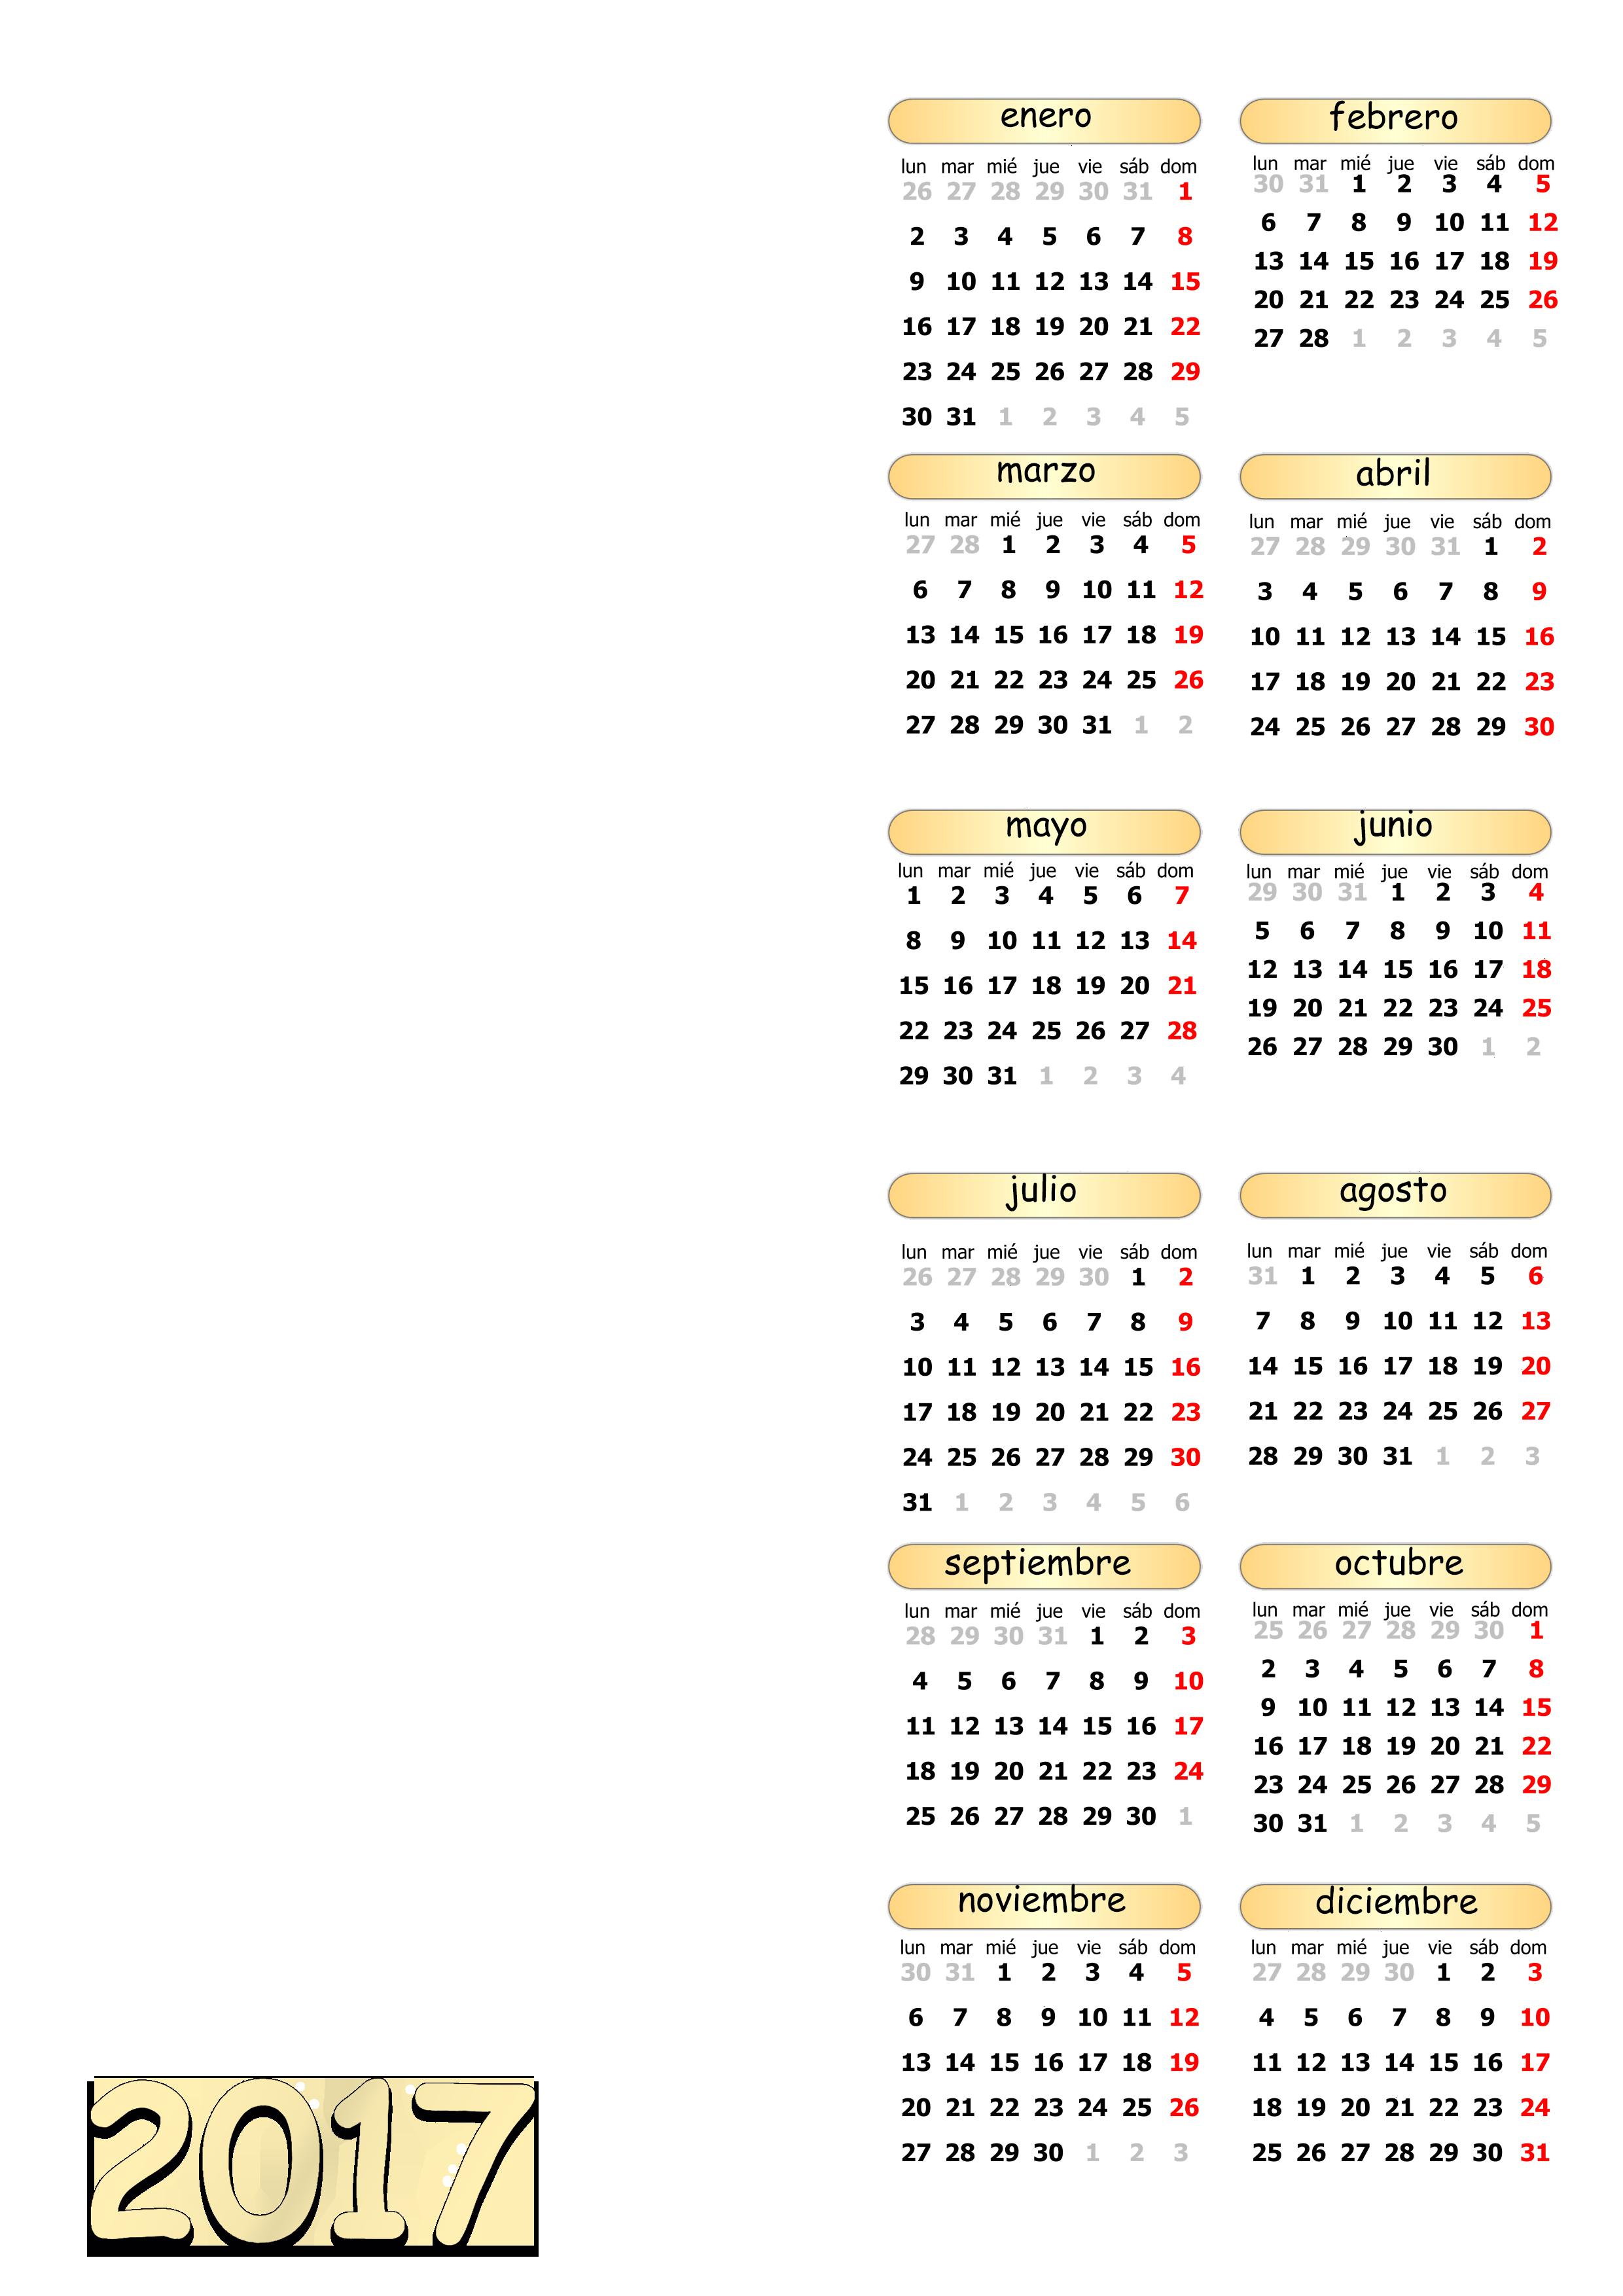 Calendarios 2017 - Plantillas PSD-PNG by AkatsukiKarasu on DeviantArt